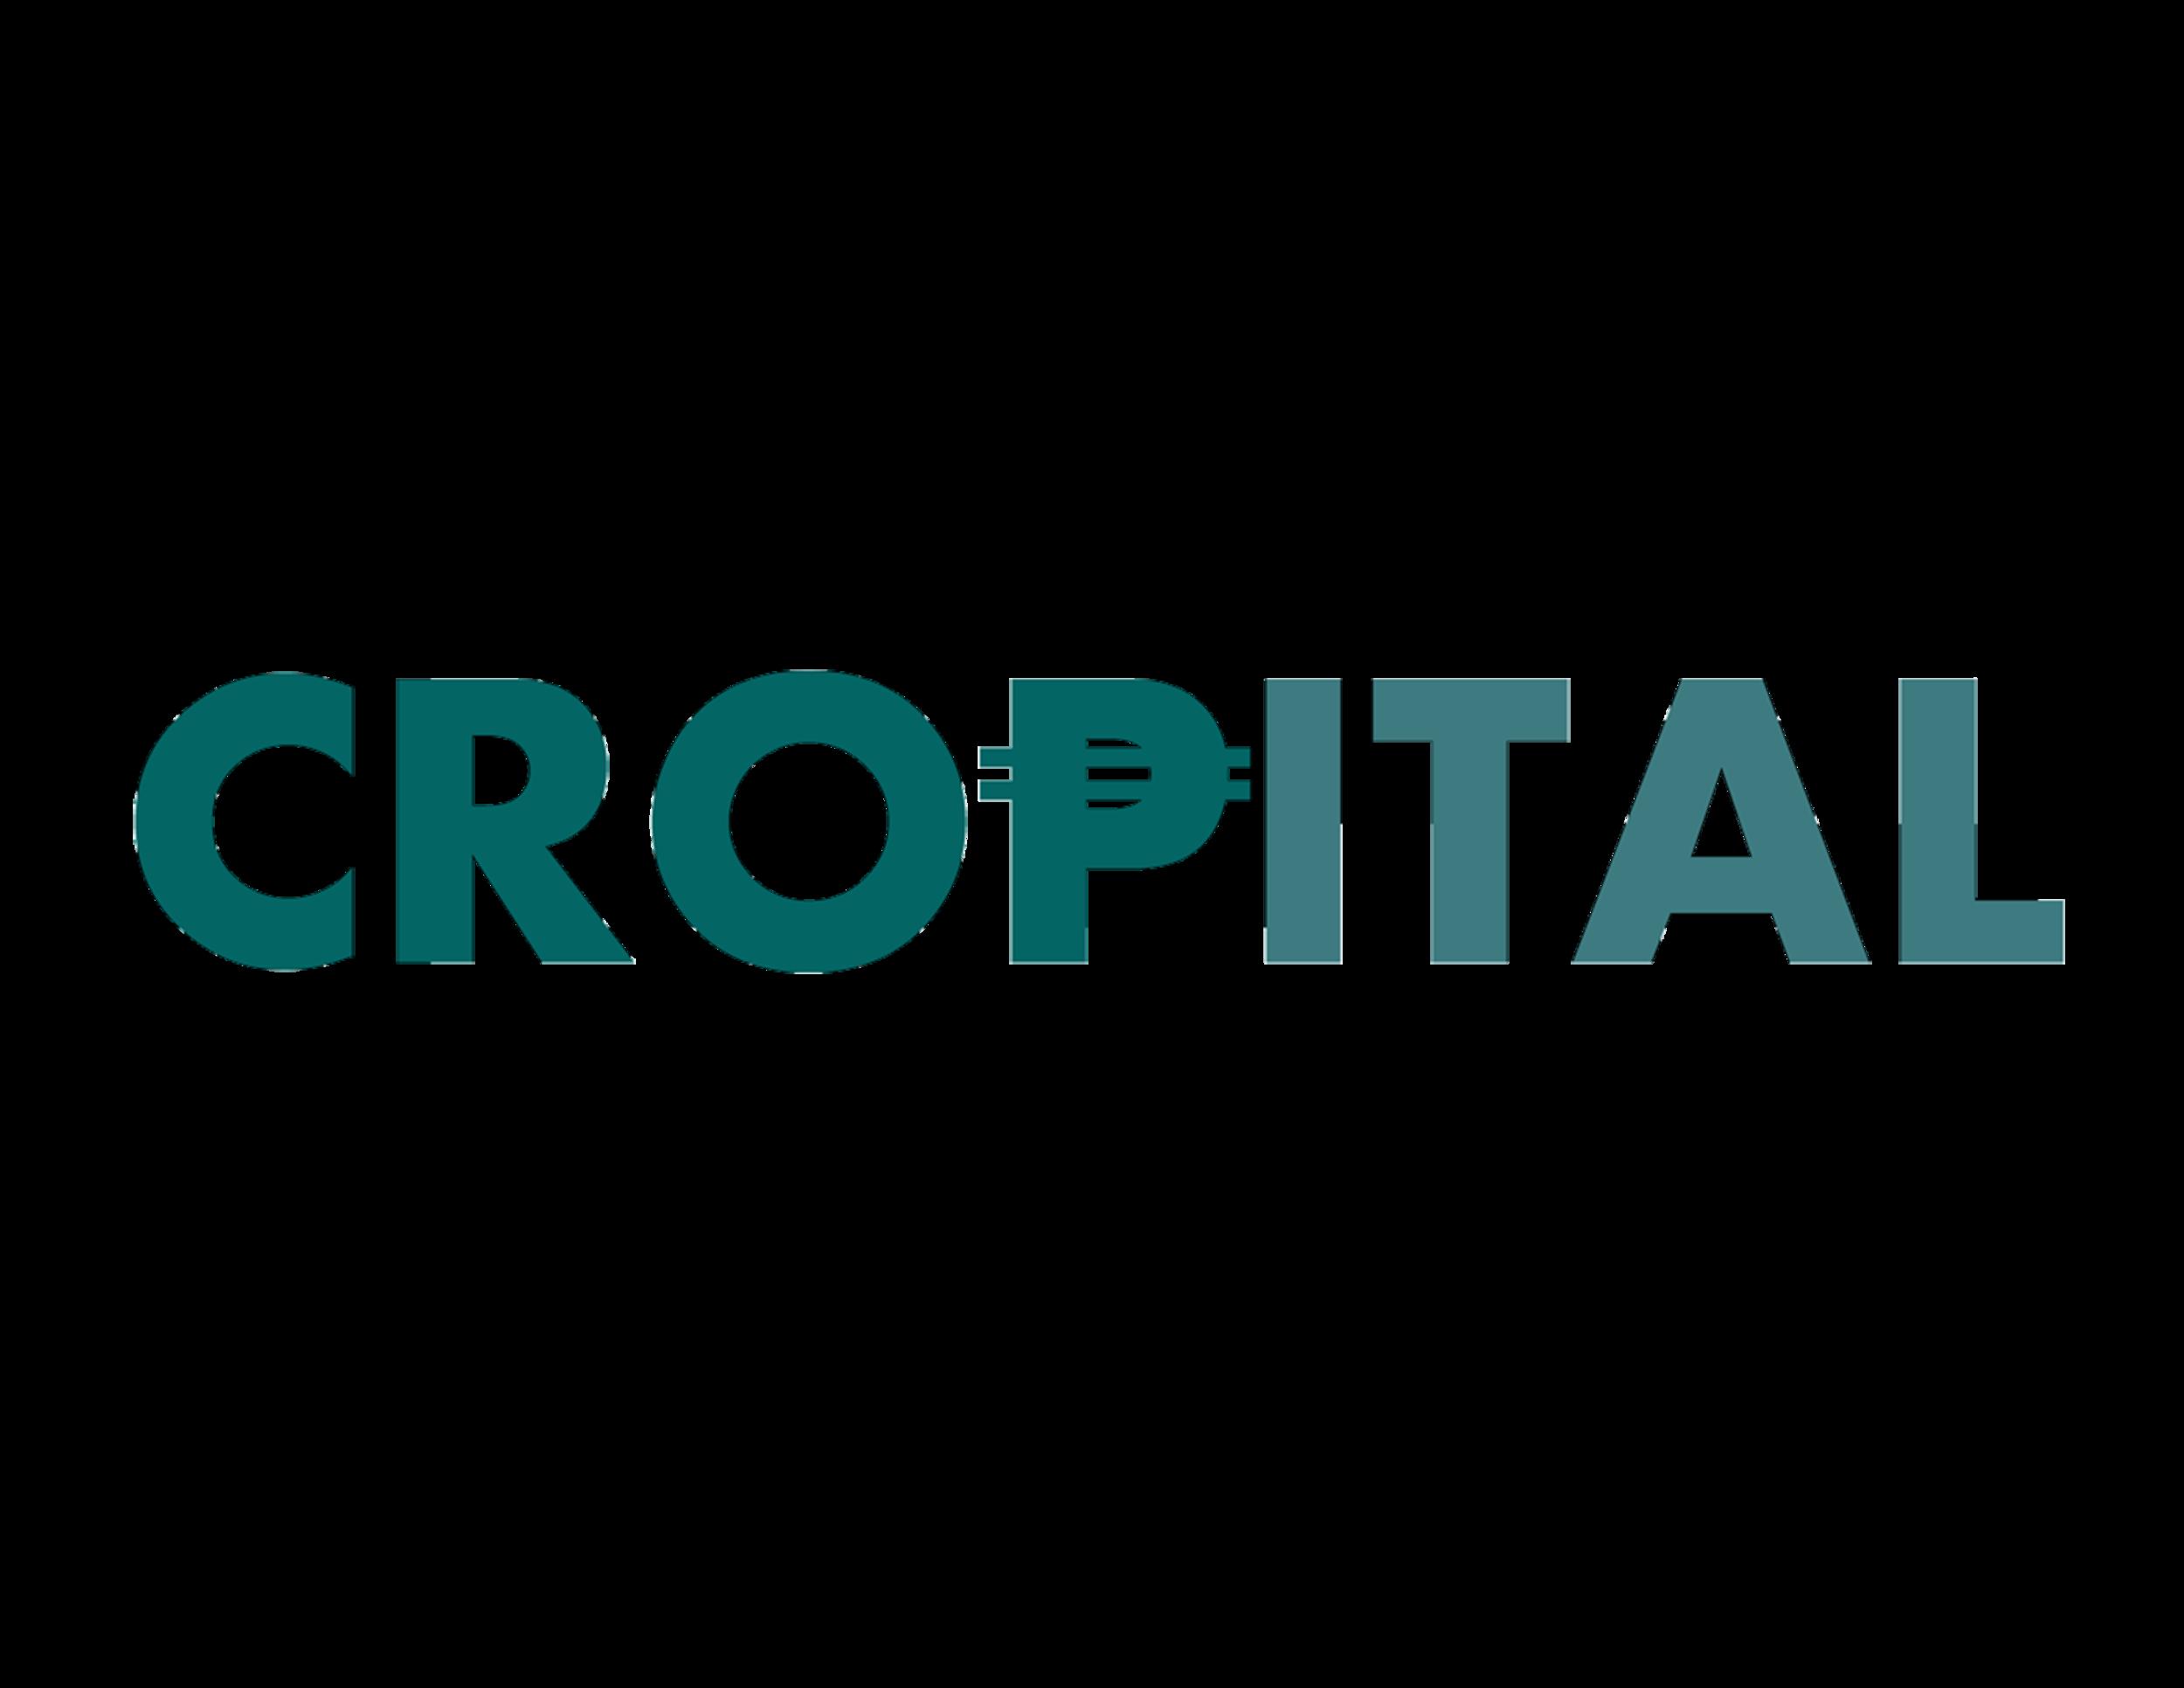 cropital.png